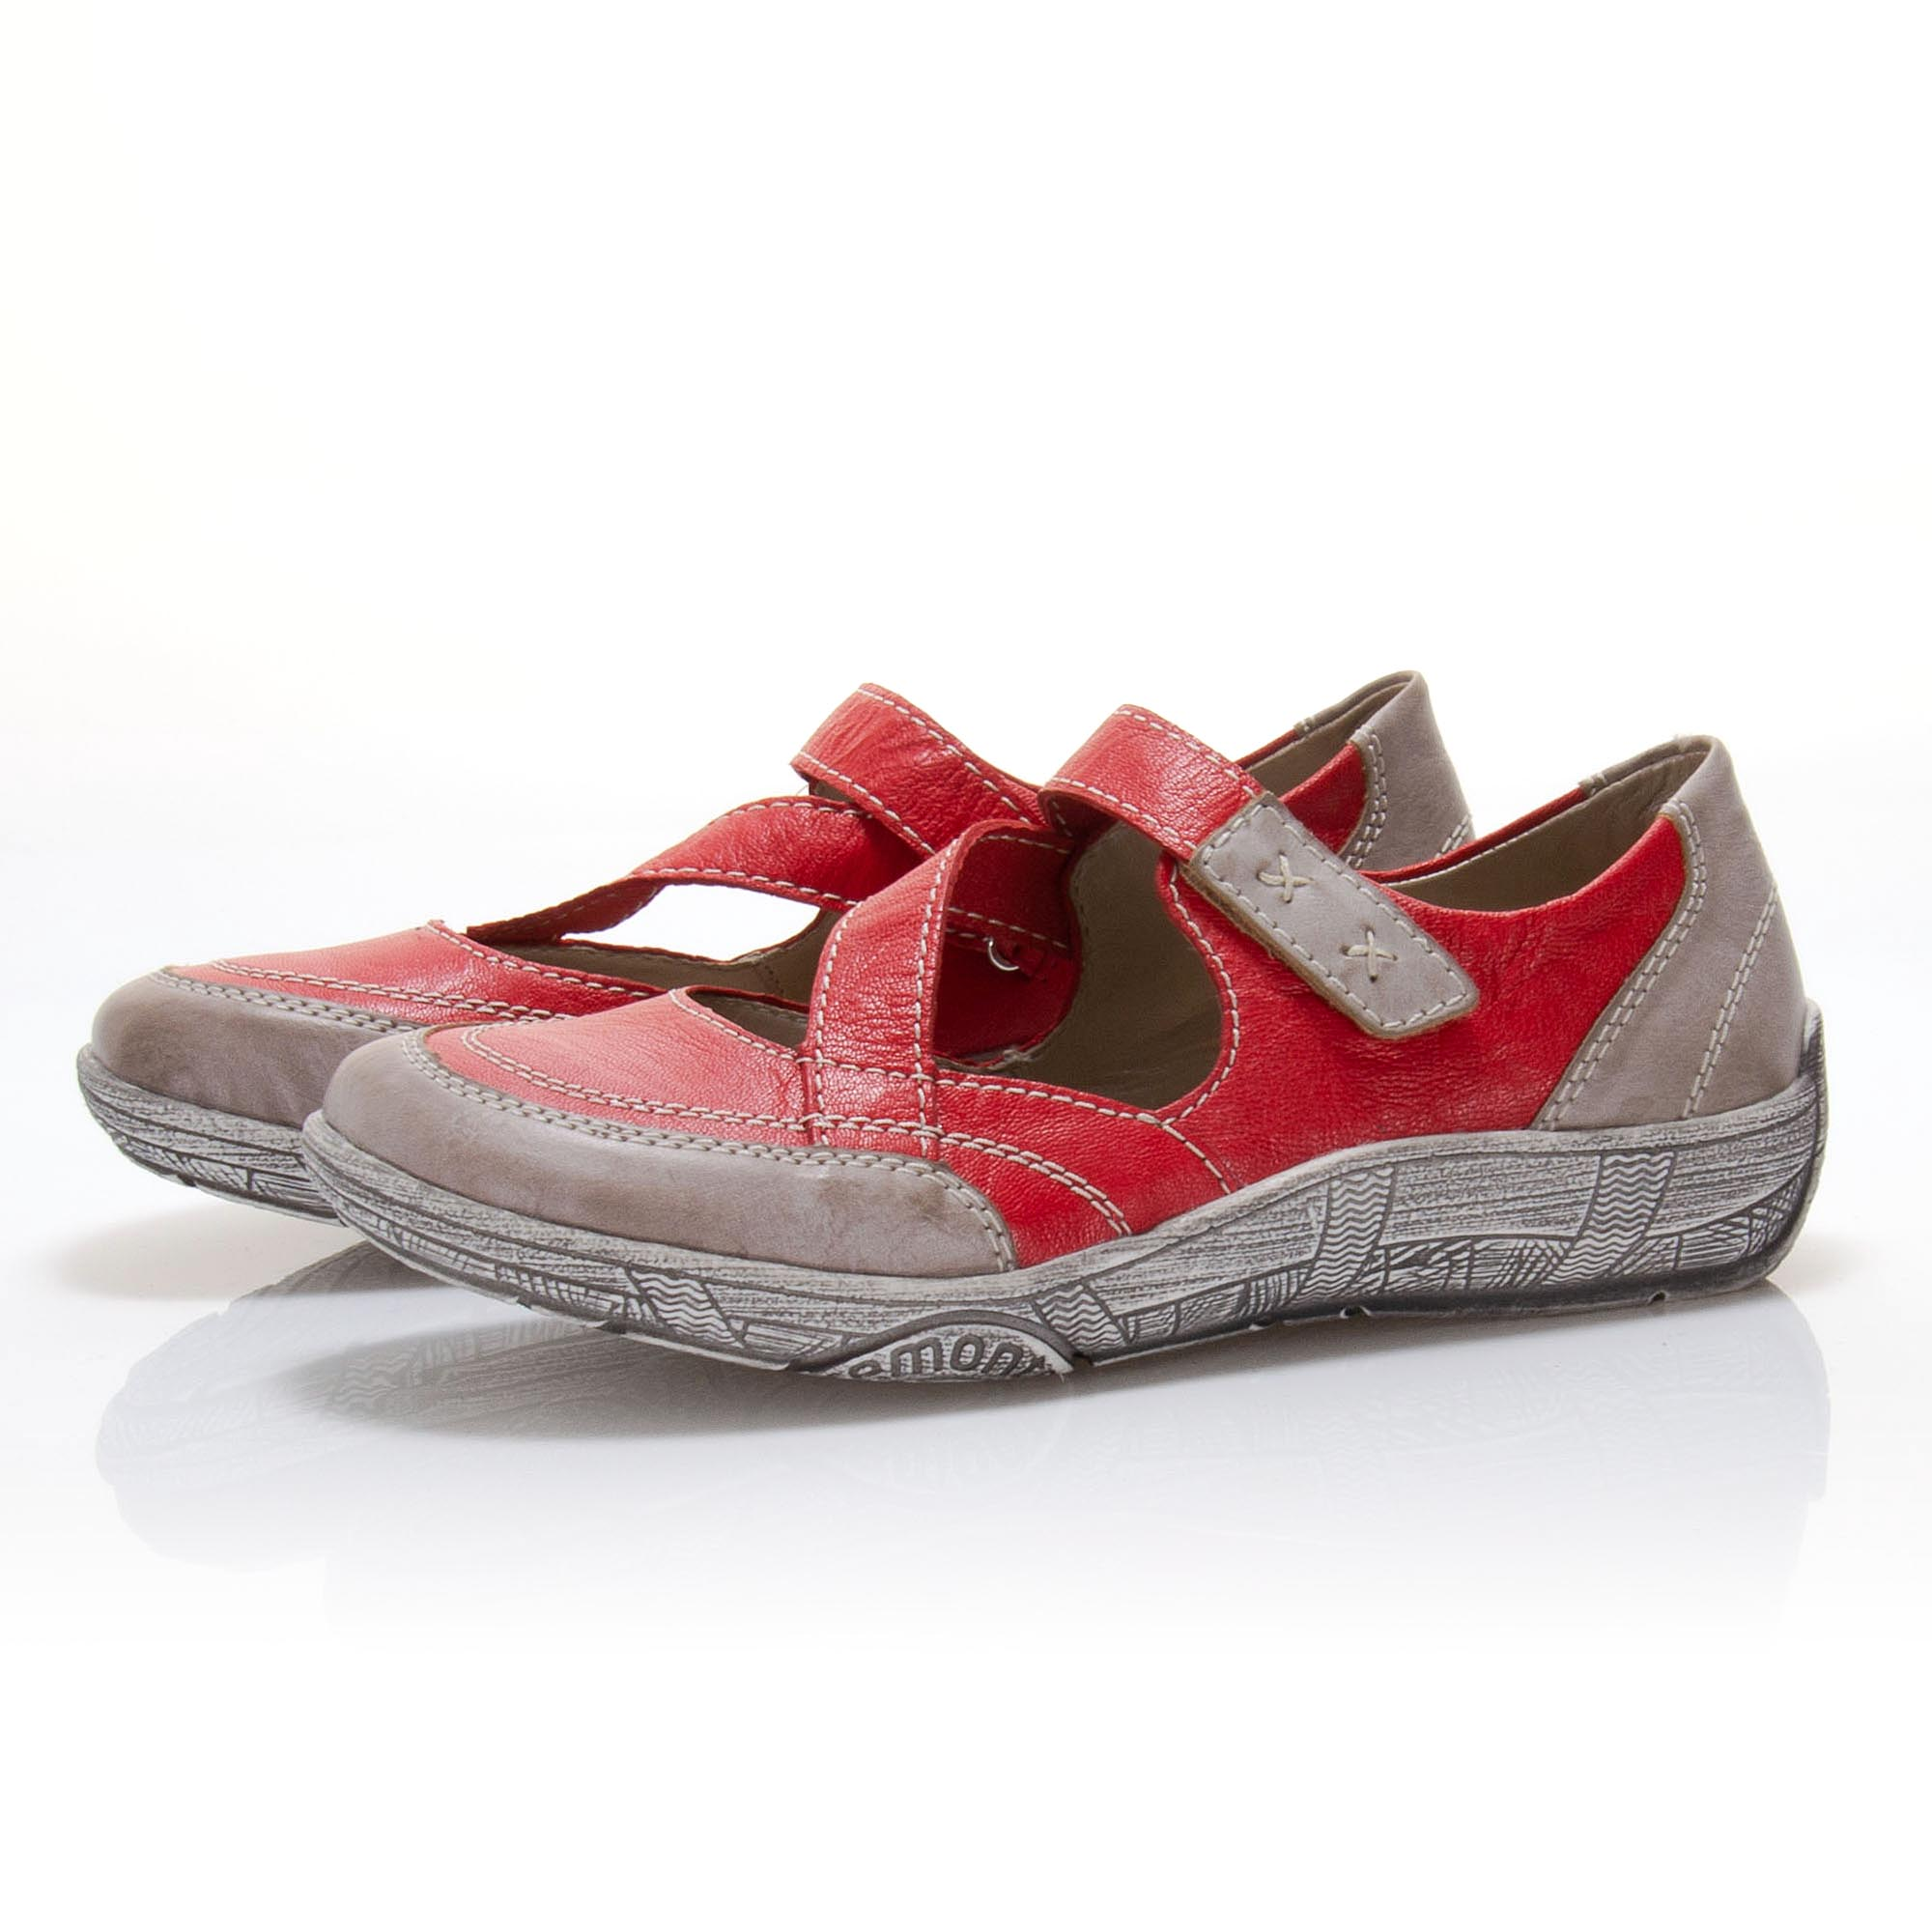 4f0c6dd61fed detail Dámská obuv RIEKER - REMONTE br D3817-33 ROT KOMBI F